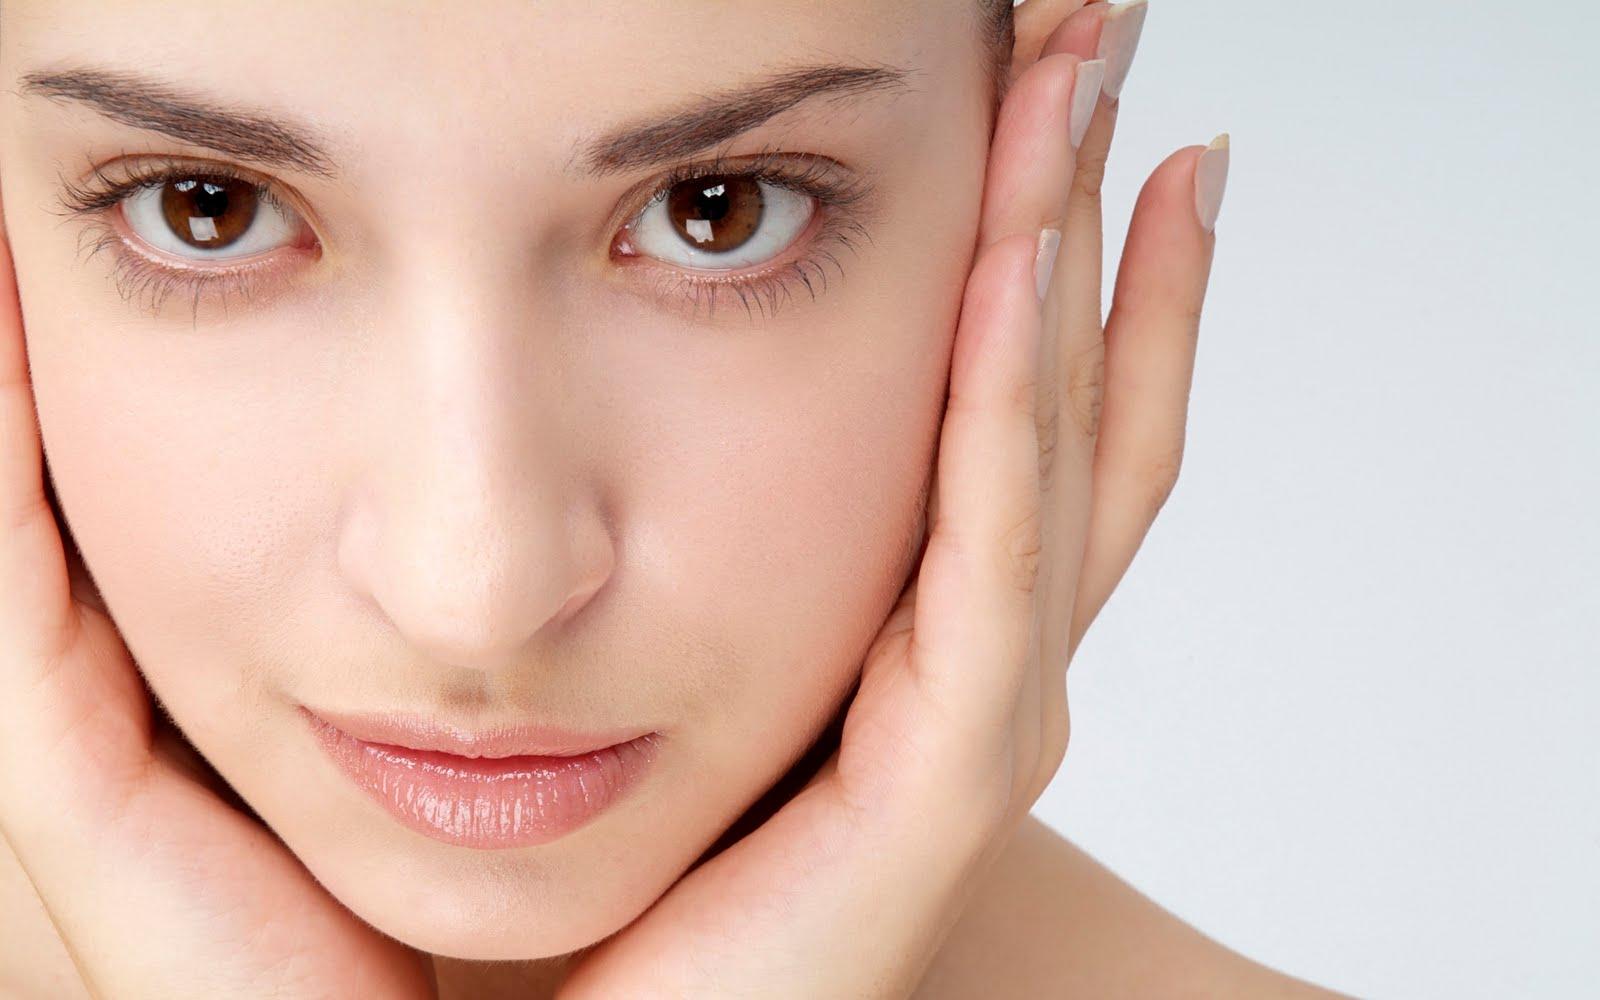 http://1.bp.blogspot.com/-Y8EWArL8HIA/T75TNGDV-SI/AAAAAAAAAI0/42C-L5V4bdM/s1600/face-beauty-tips-1.jpg